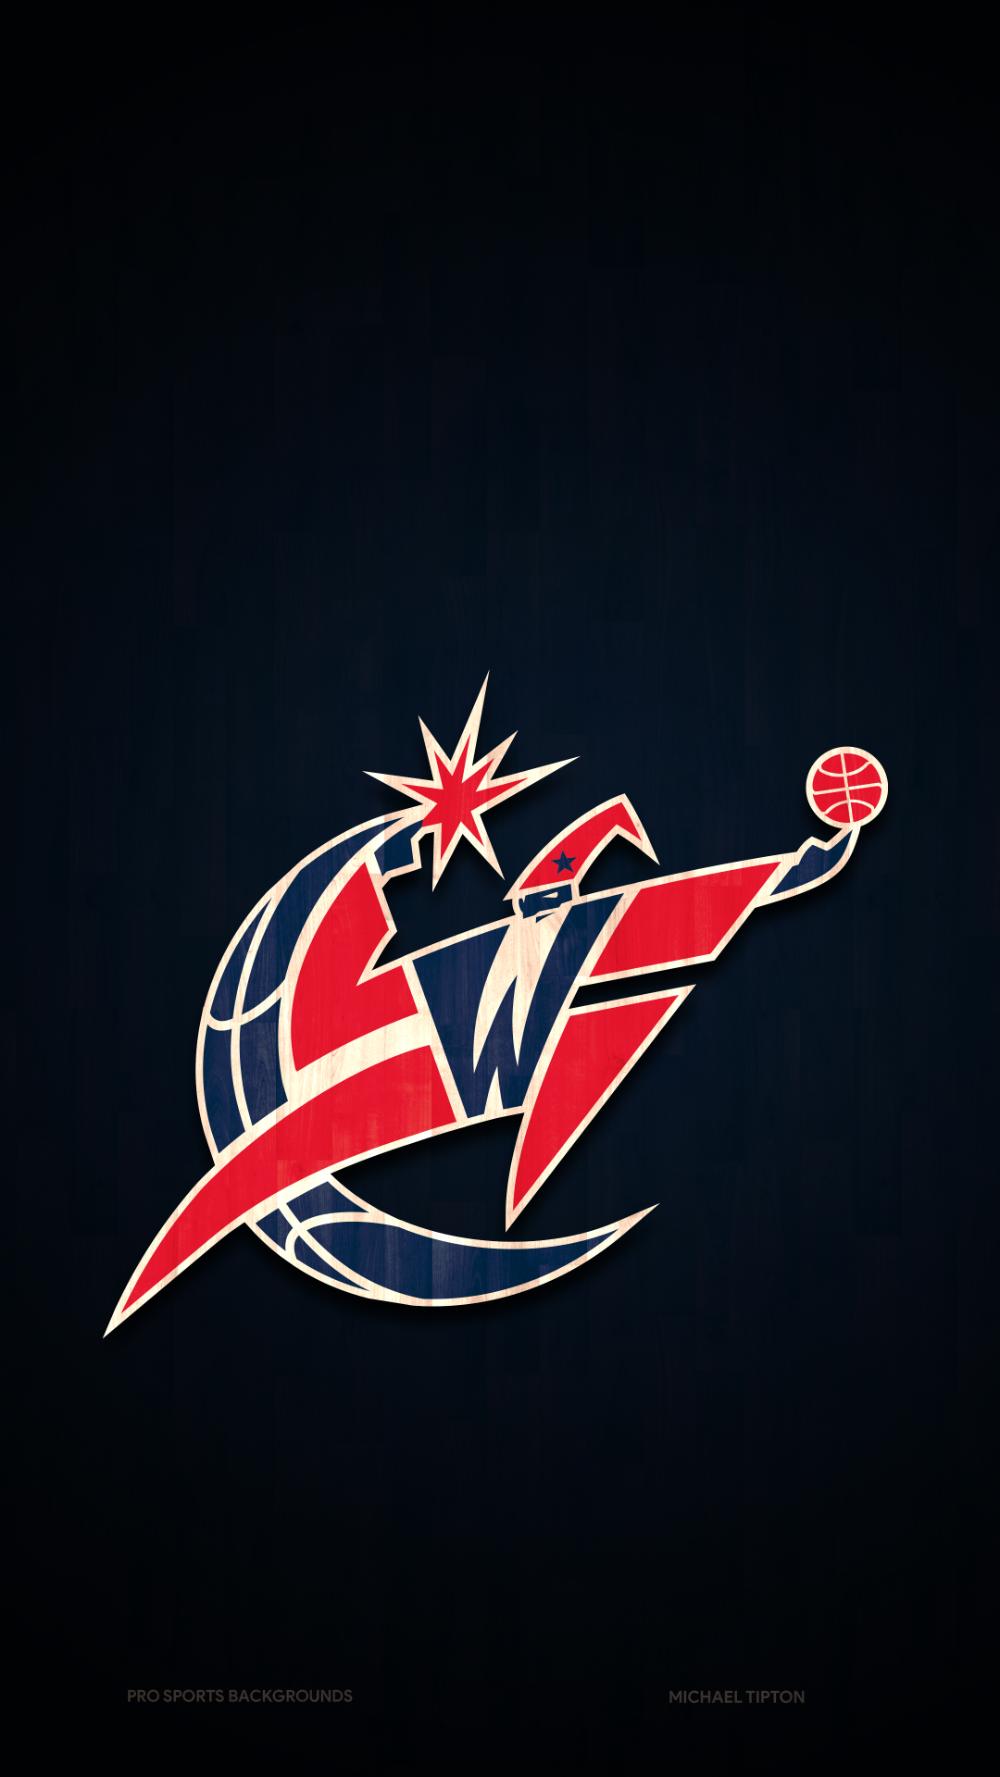 Washington Wizards Wallpapers Pro Sports Backgrounds In 2021 Washington Wizards Washington Wallpaper